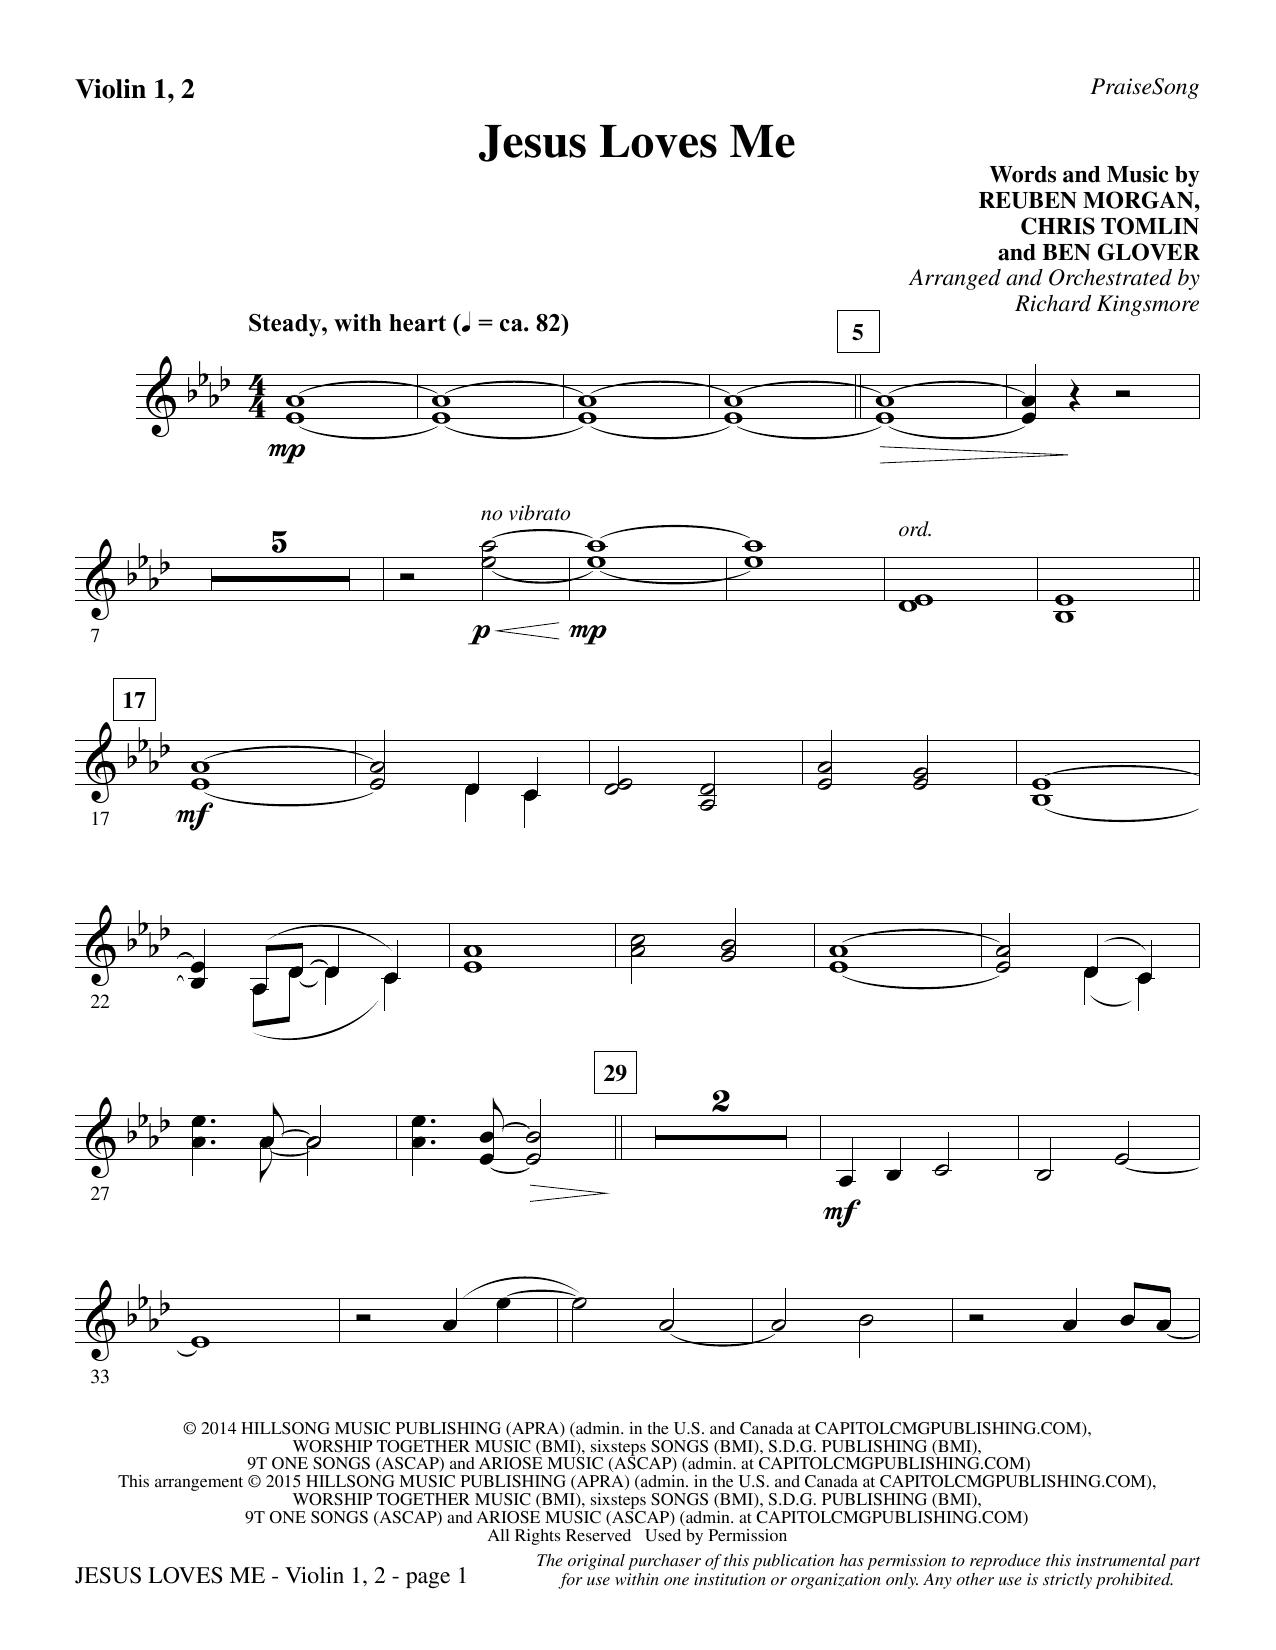 Jesus Loves Me - Violin 1, 2 sheet music